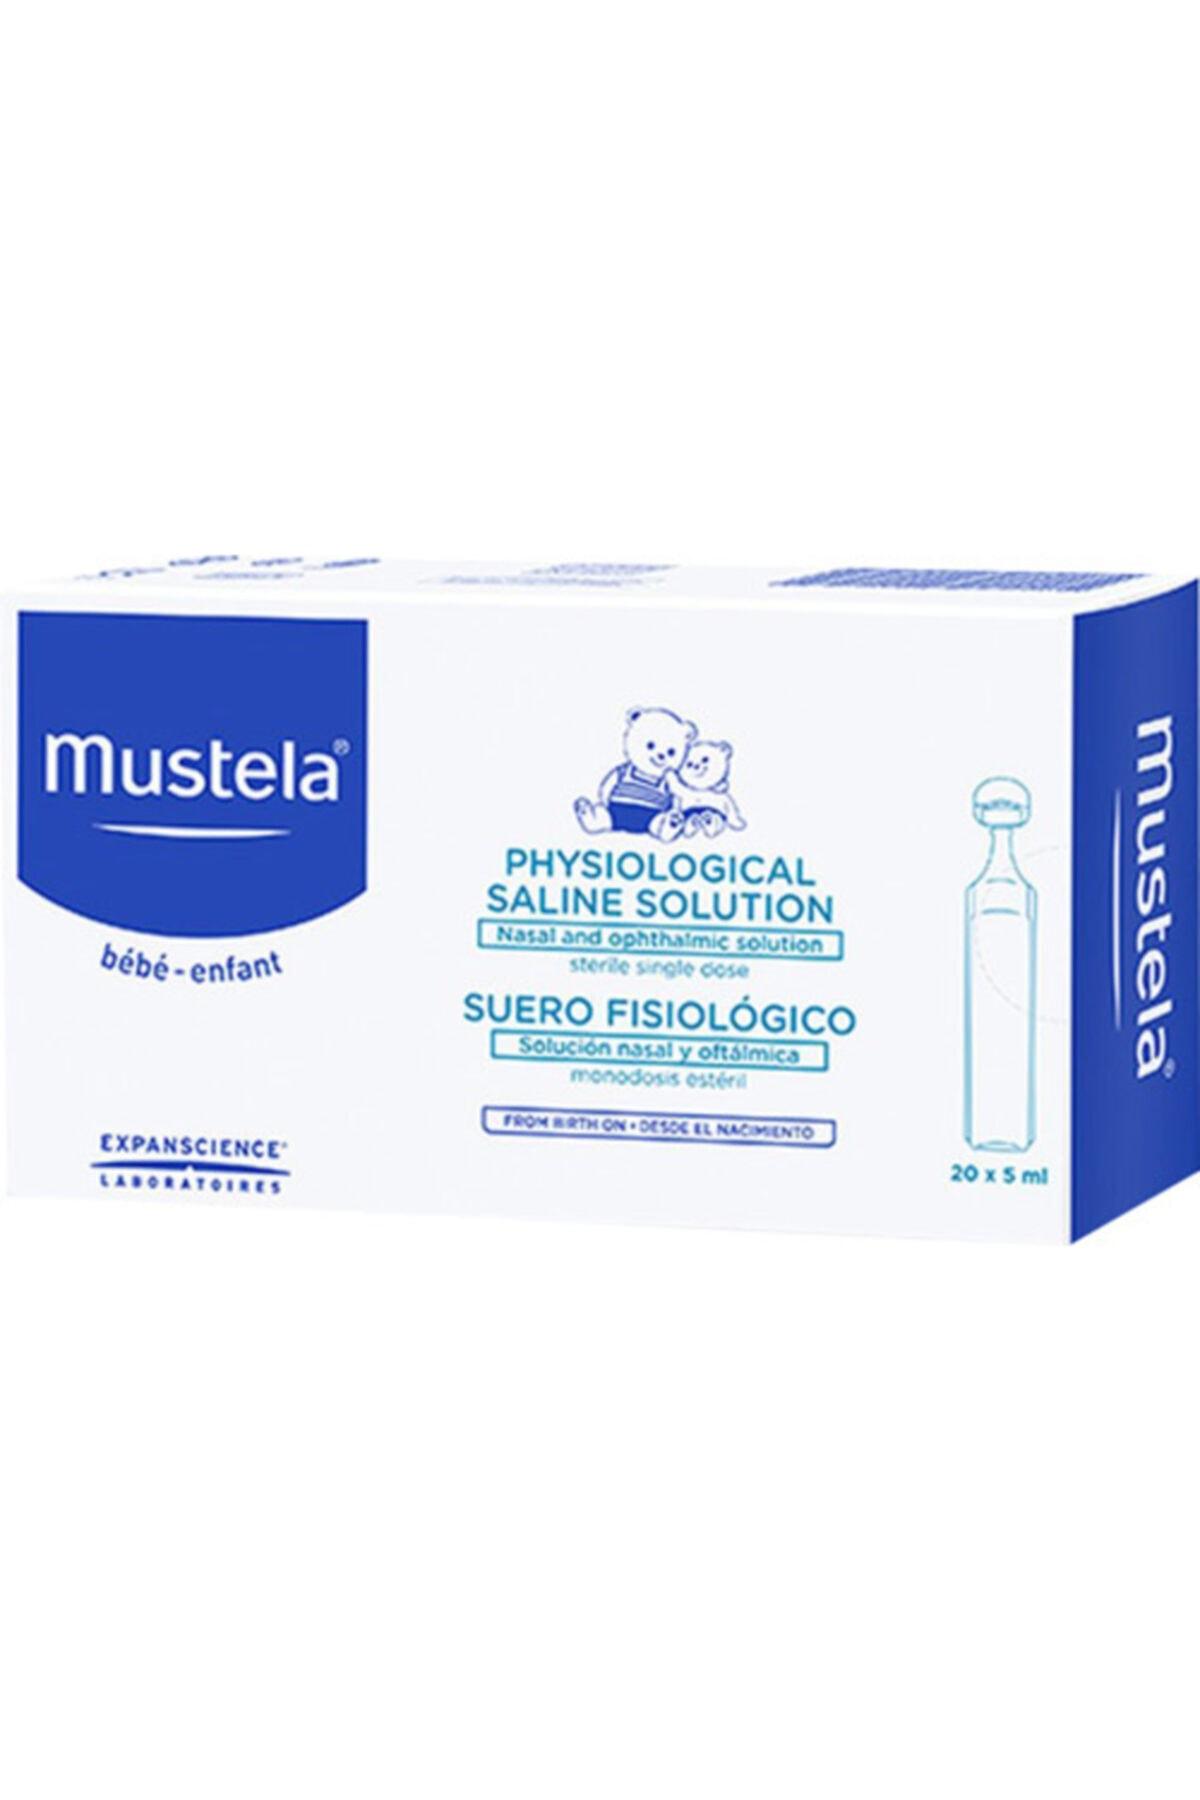 Mustela Serum Fizyolojik 5mlx20 Li Flakon-s.k.t 12-2022 1